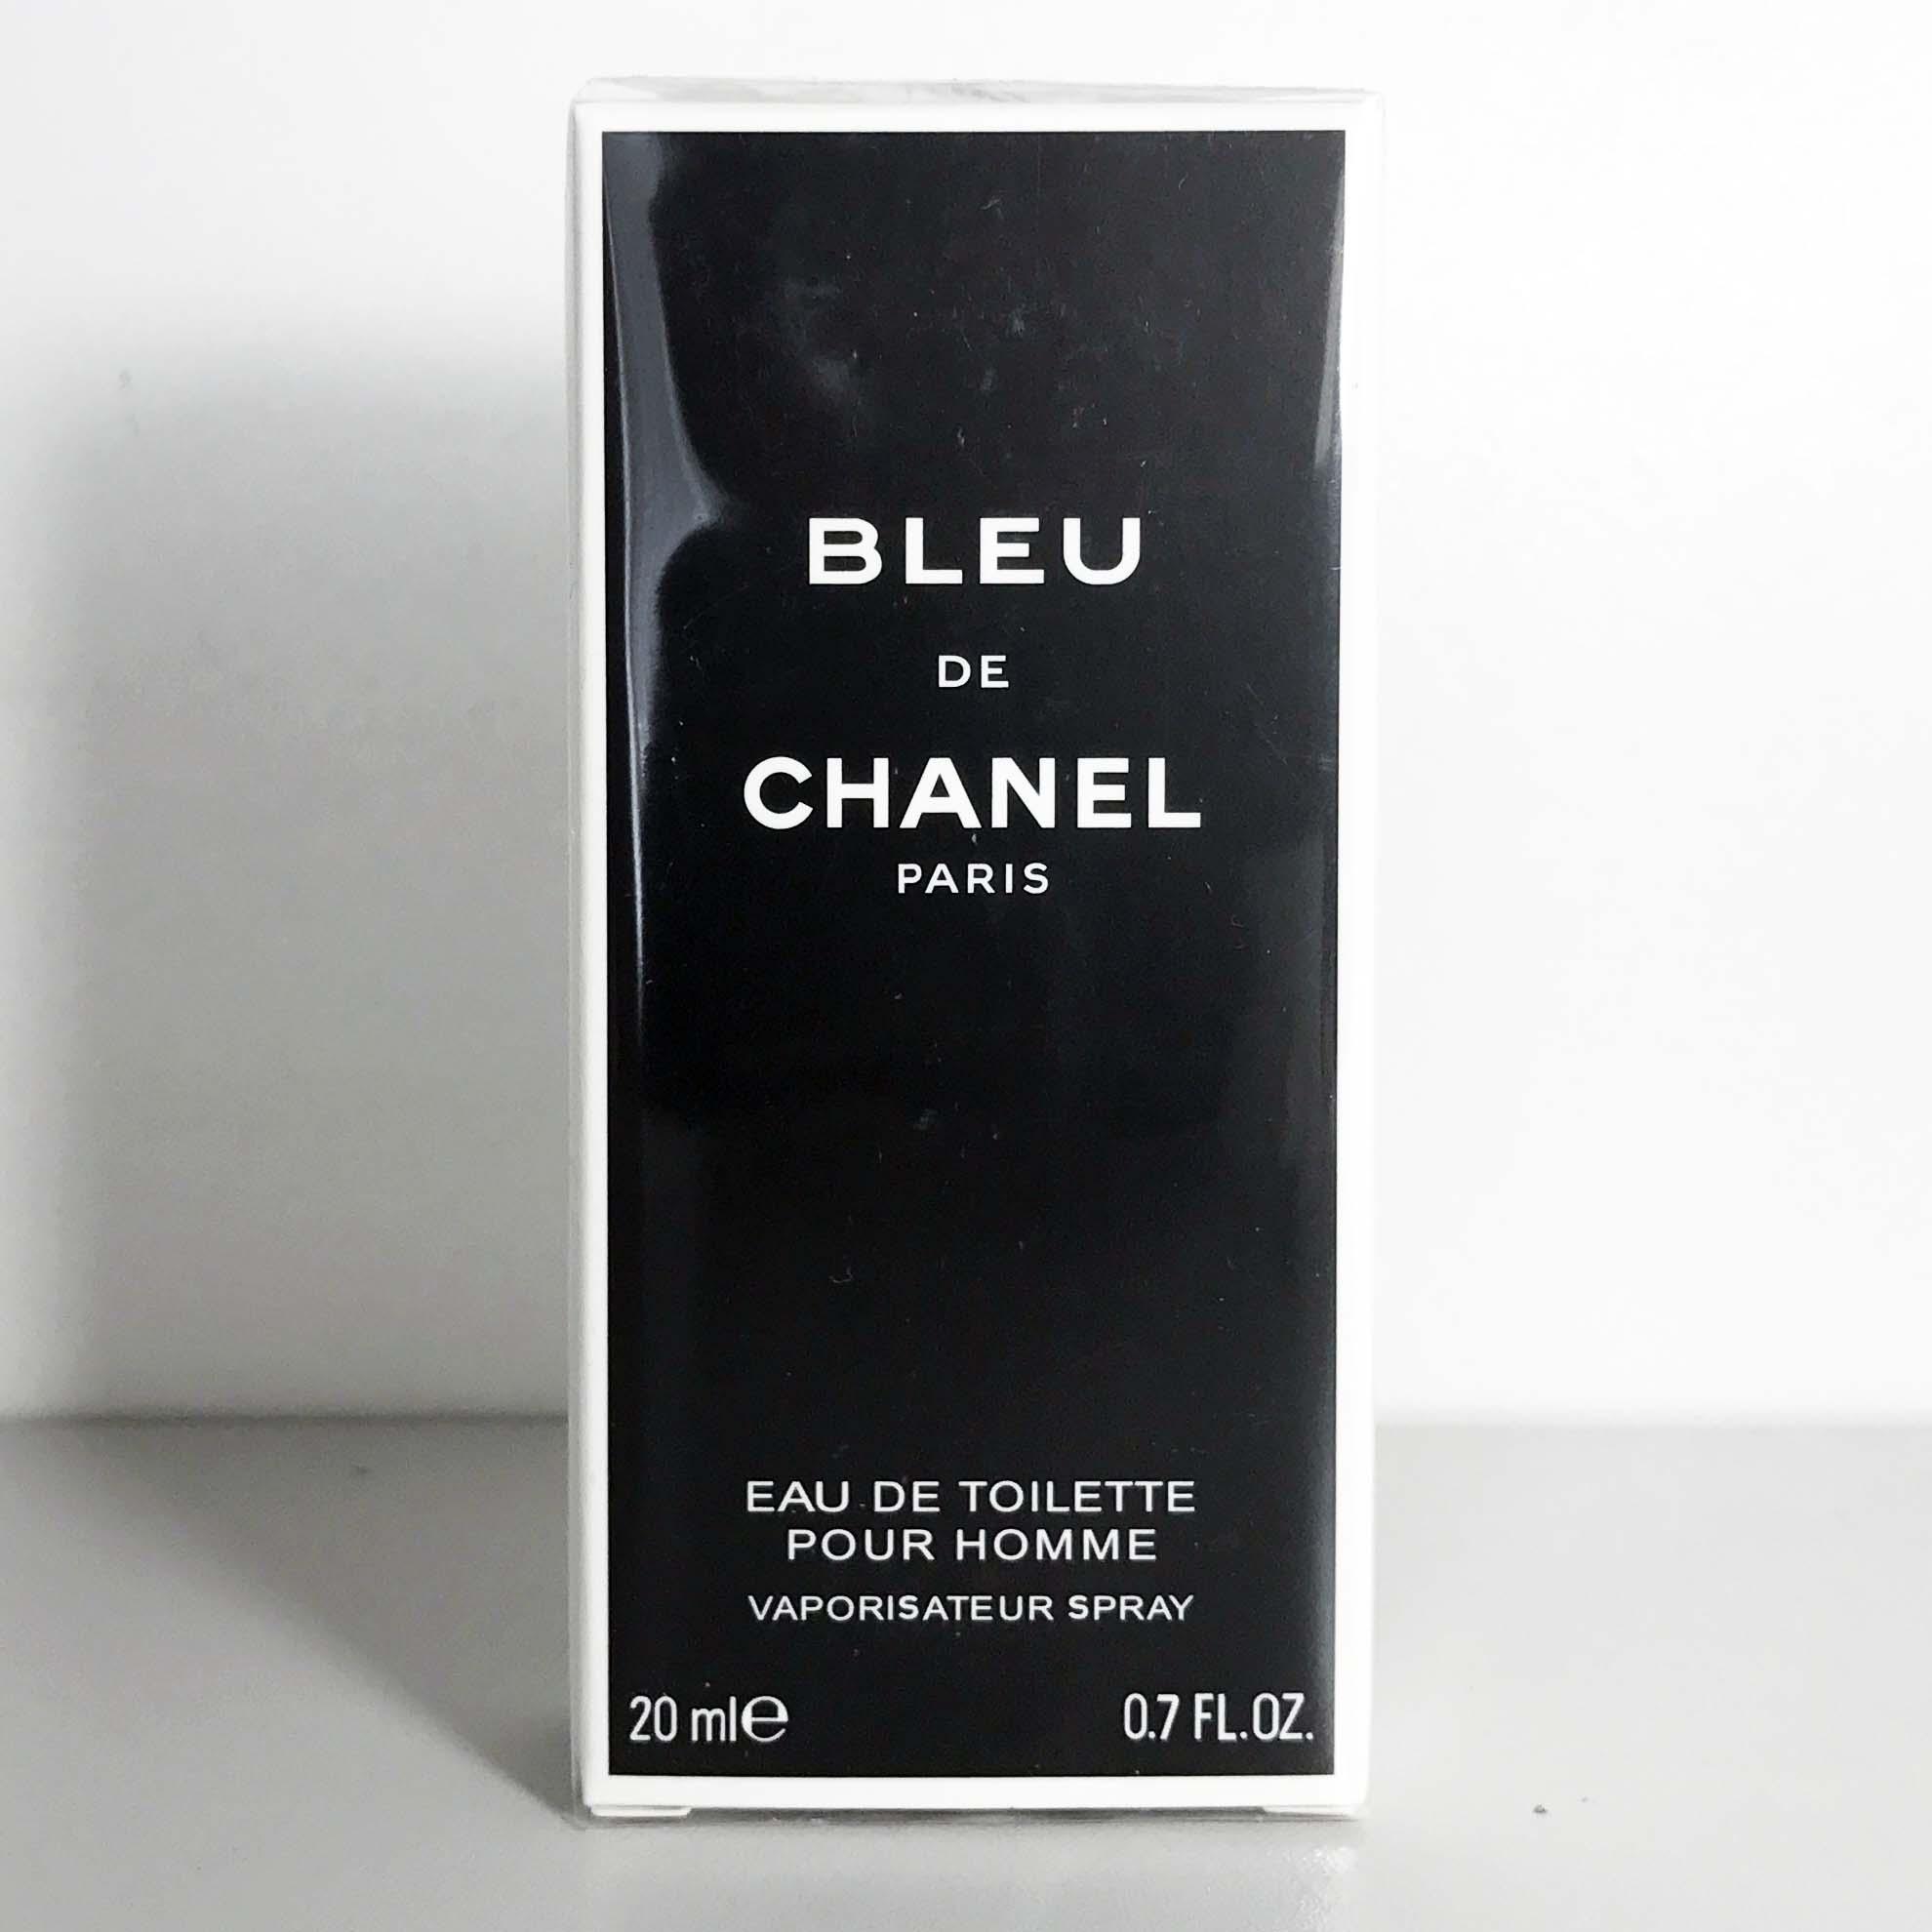 Chanel Bleu De Chanel 20ml Gold Parfum